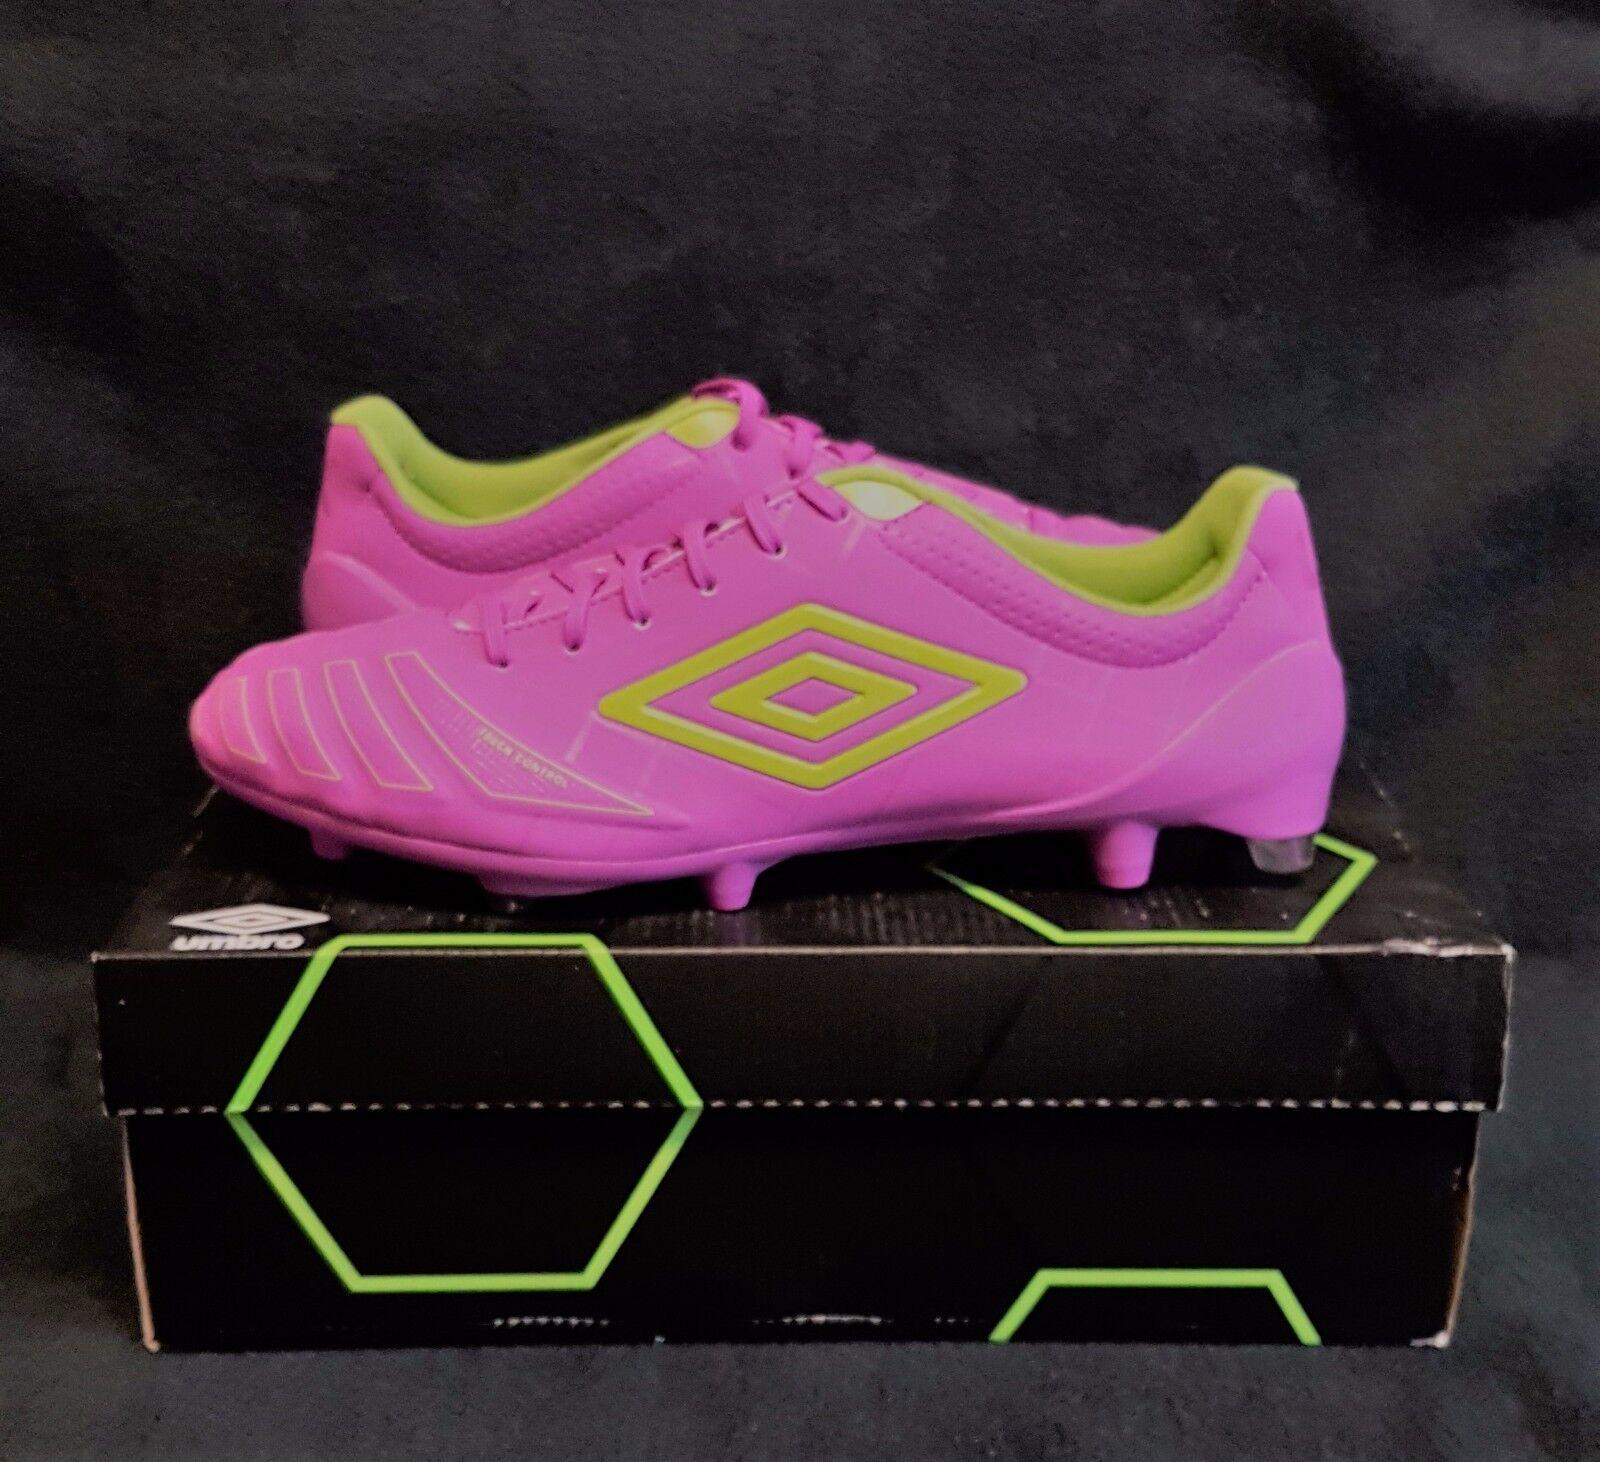 UMBRO UX ACCURO Pro HG FG Soccer Football Crampons (Sz 11.5) violet vert